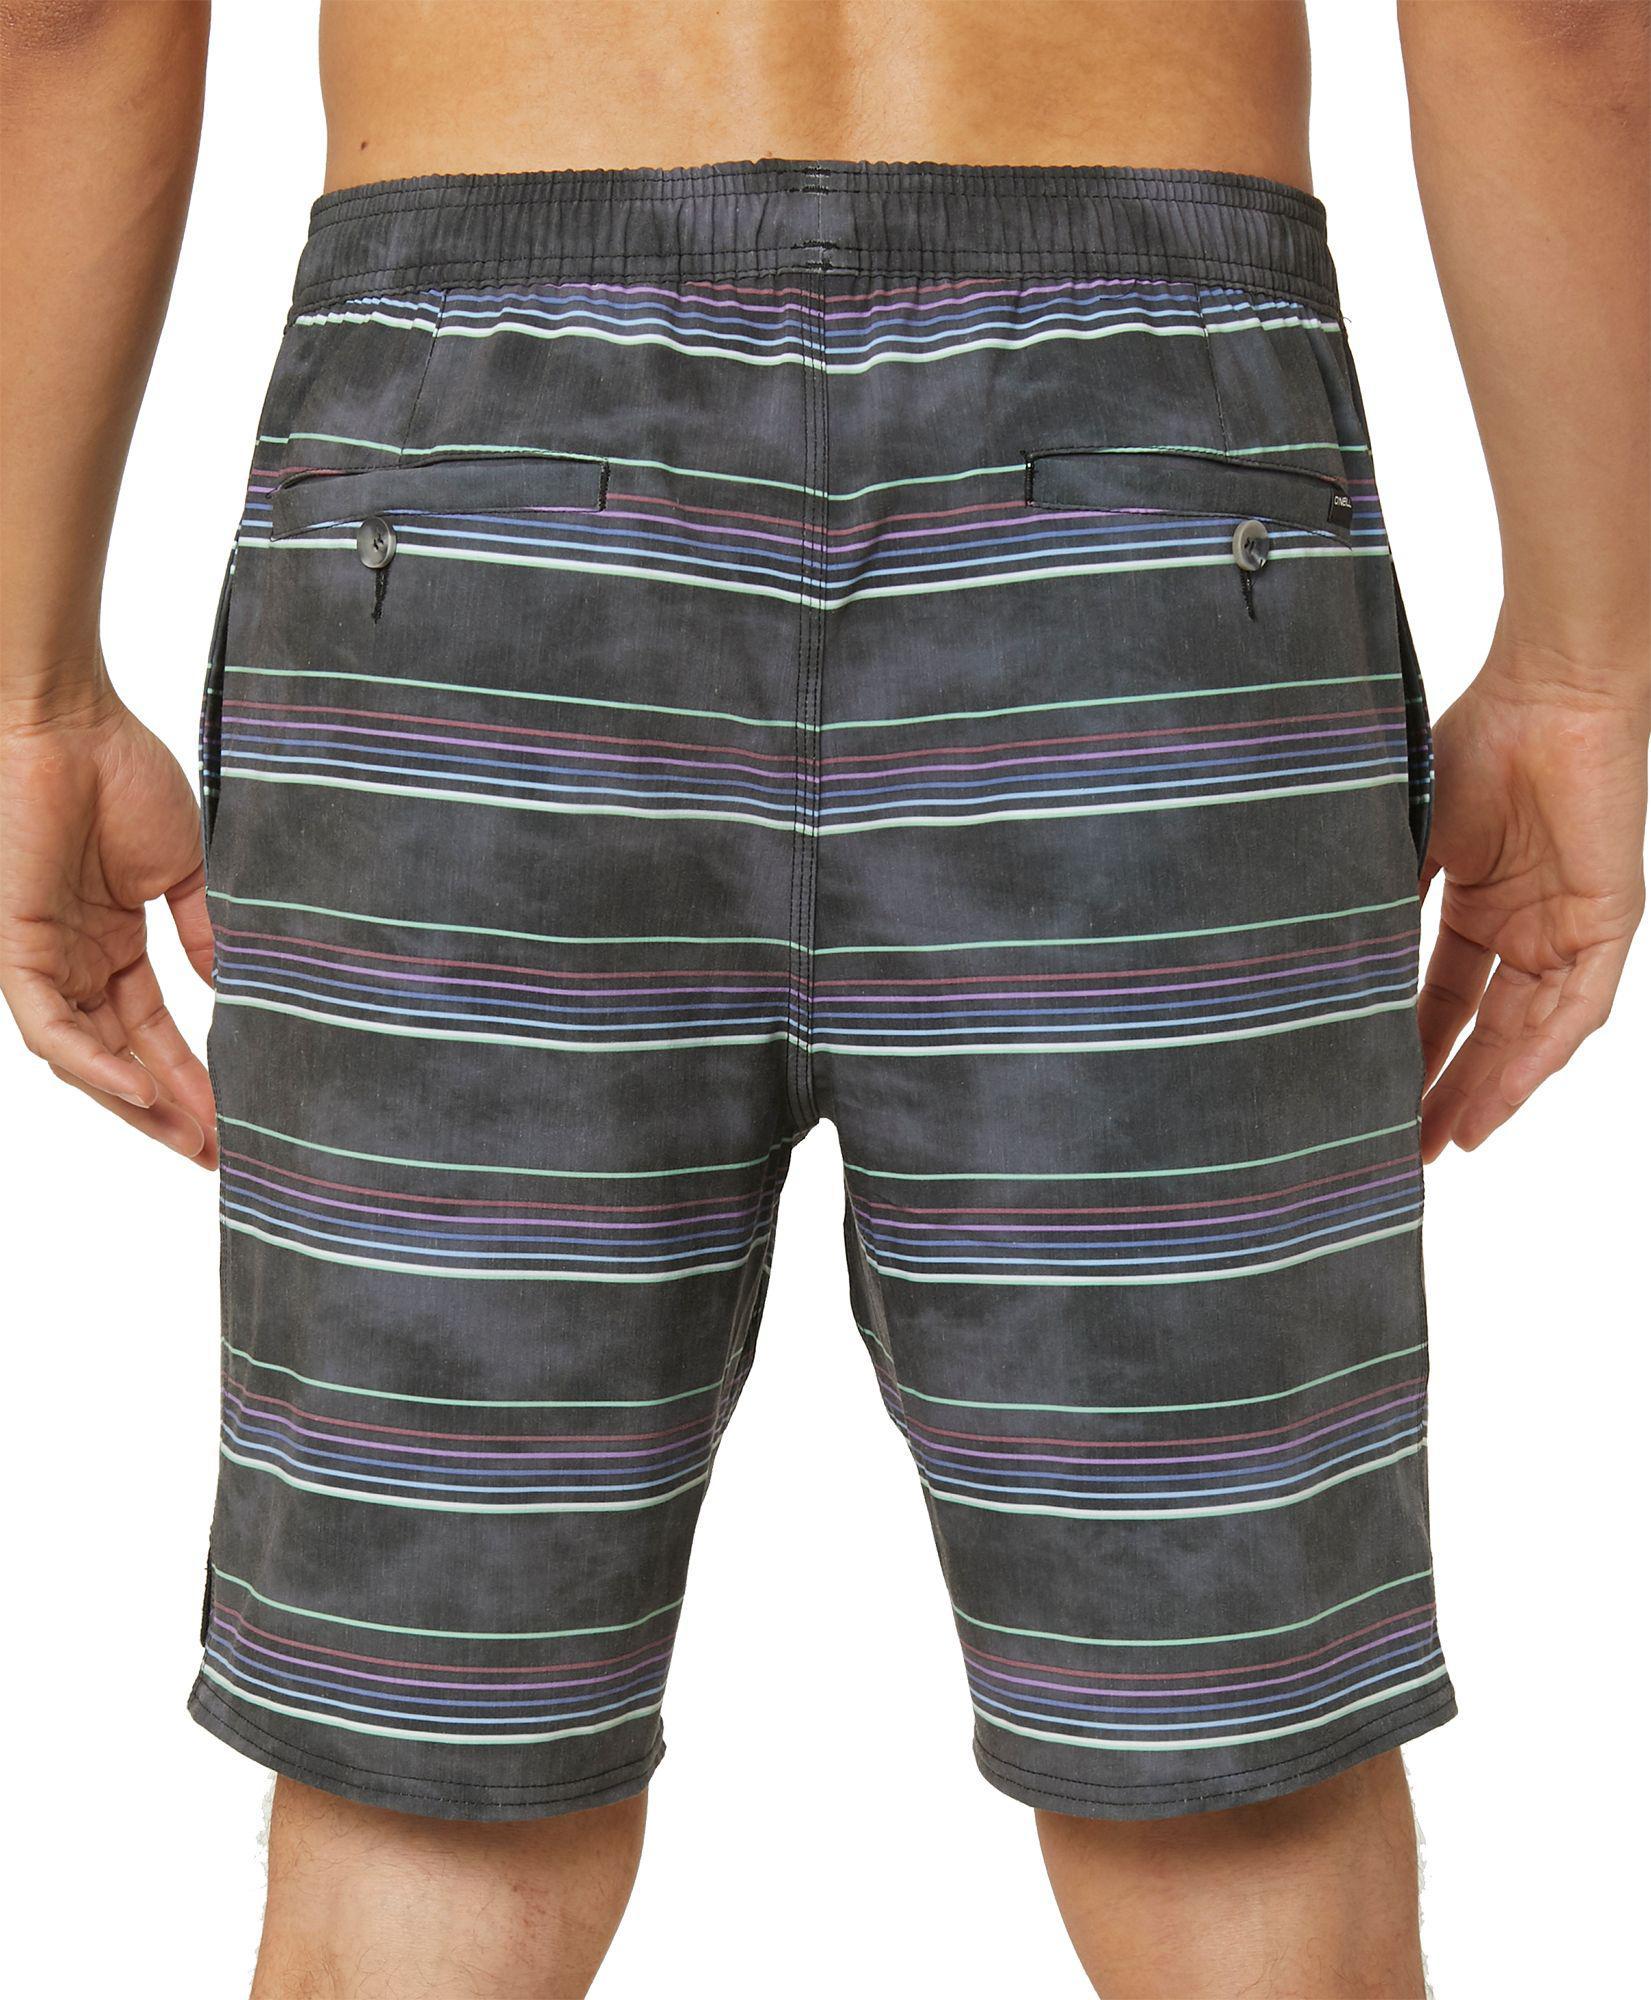 d703664ac5505 Lyst - O'neill Sportswear Hodge Podge Volley Cruzer Board Shorts in Black  for Men